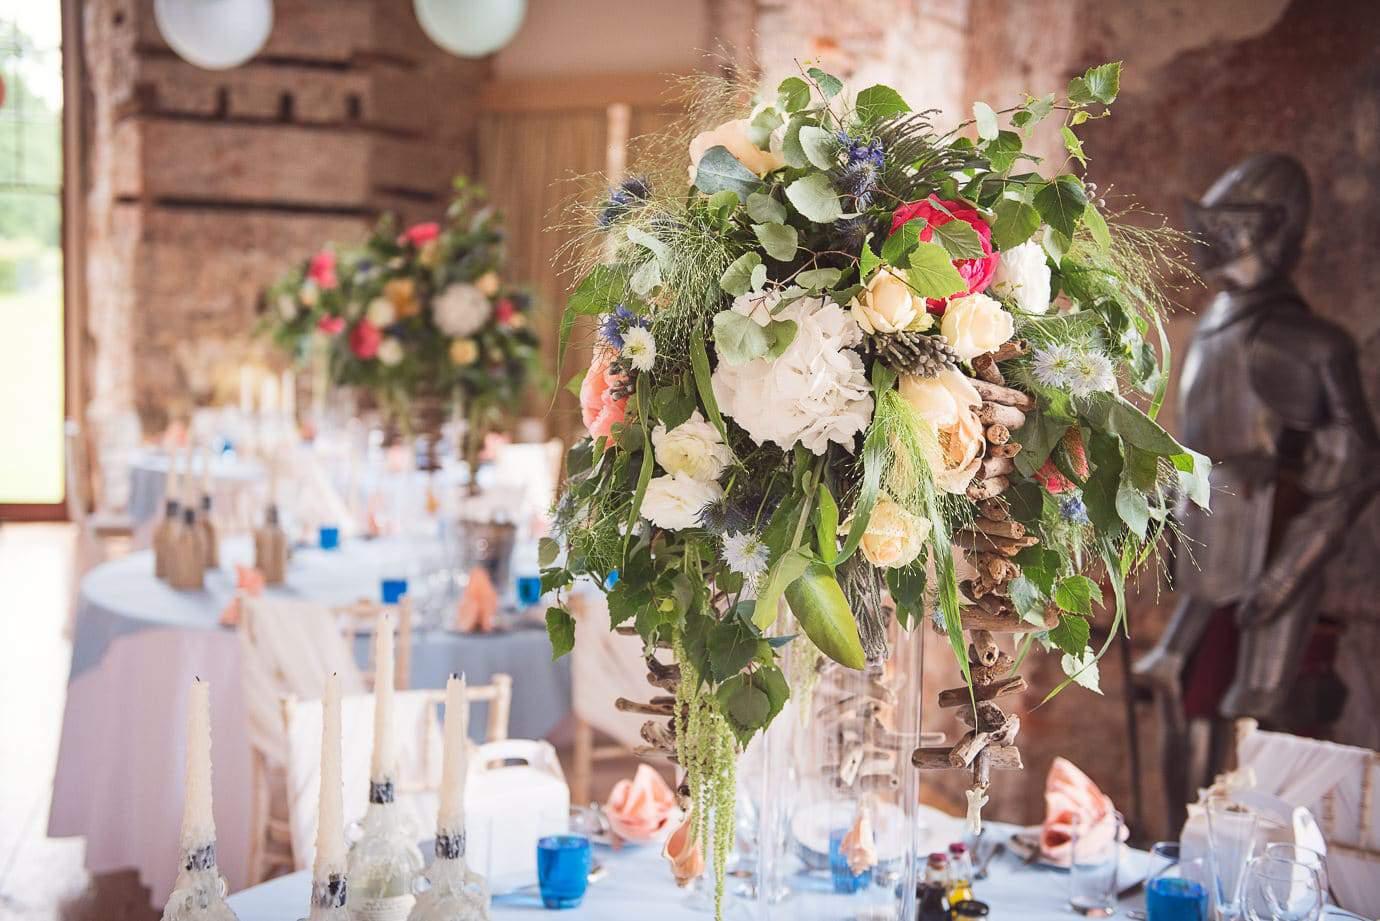 Huge rustic wedding flower display on wedding breakfast table at castle wedding